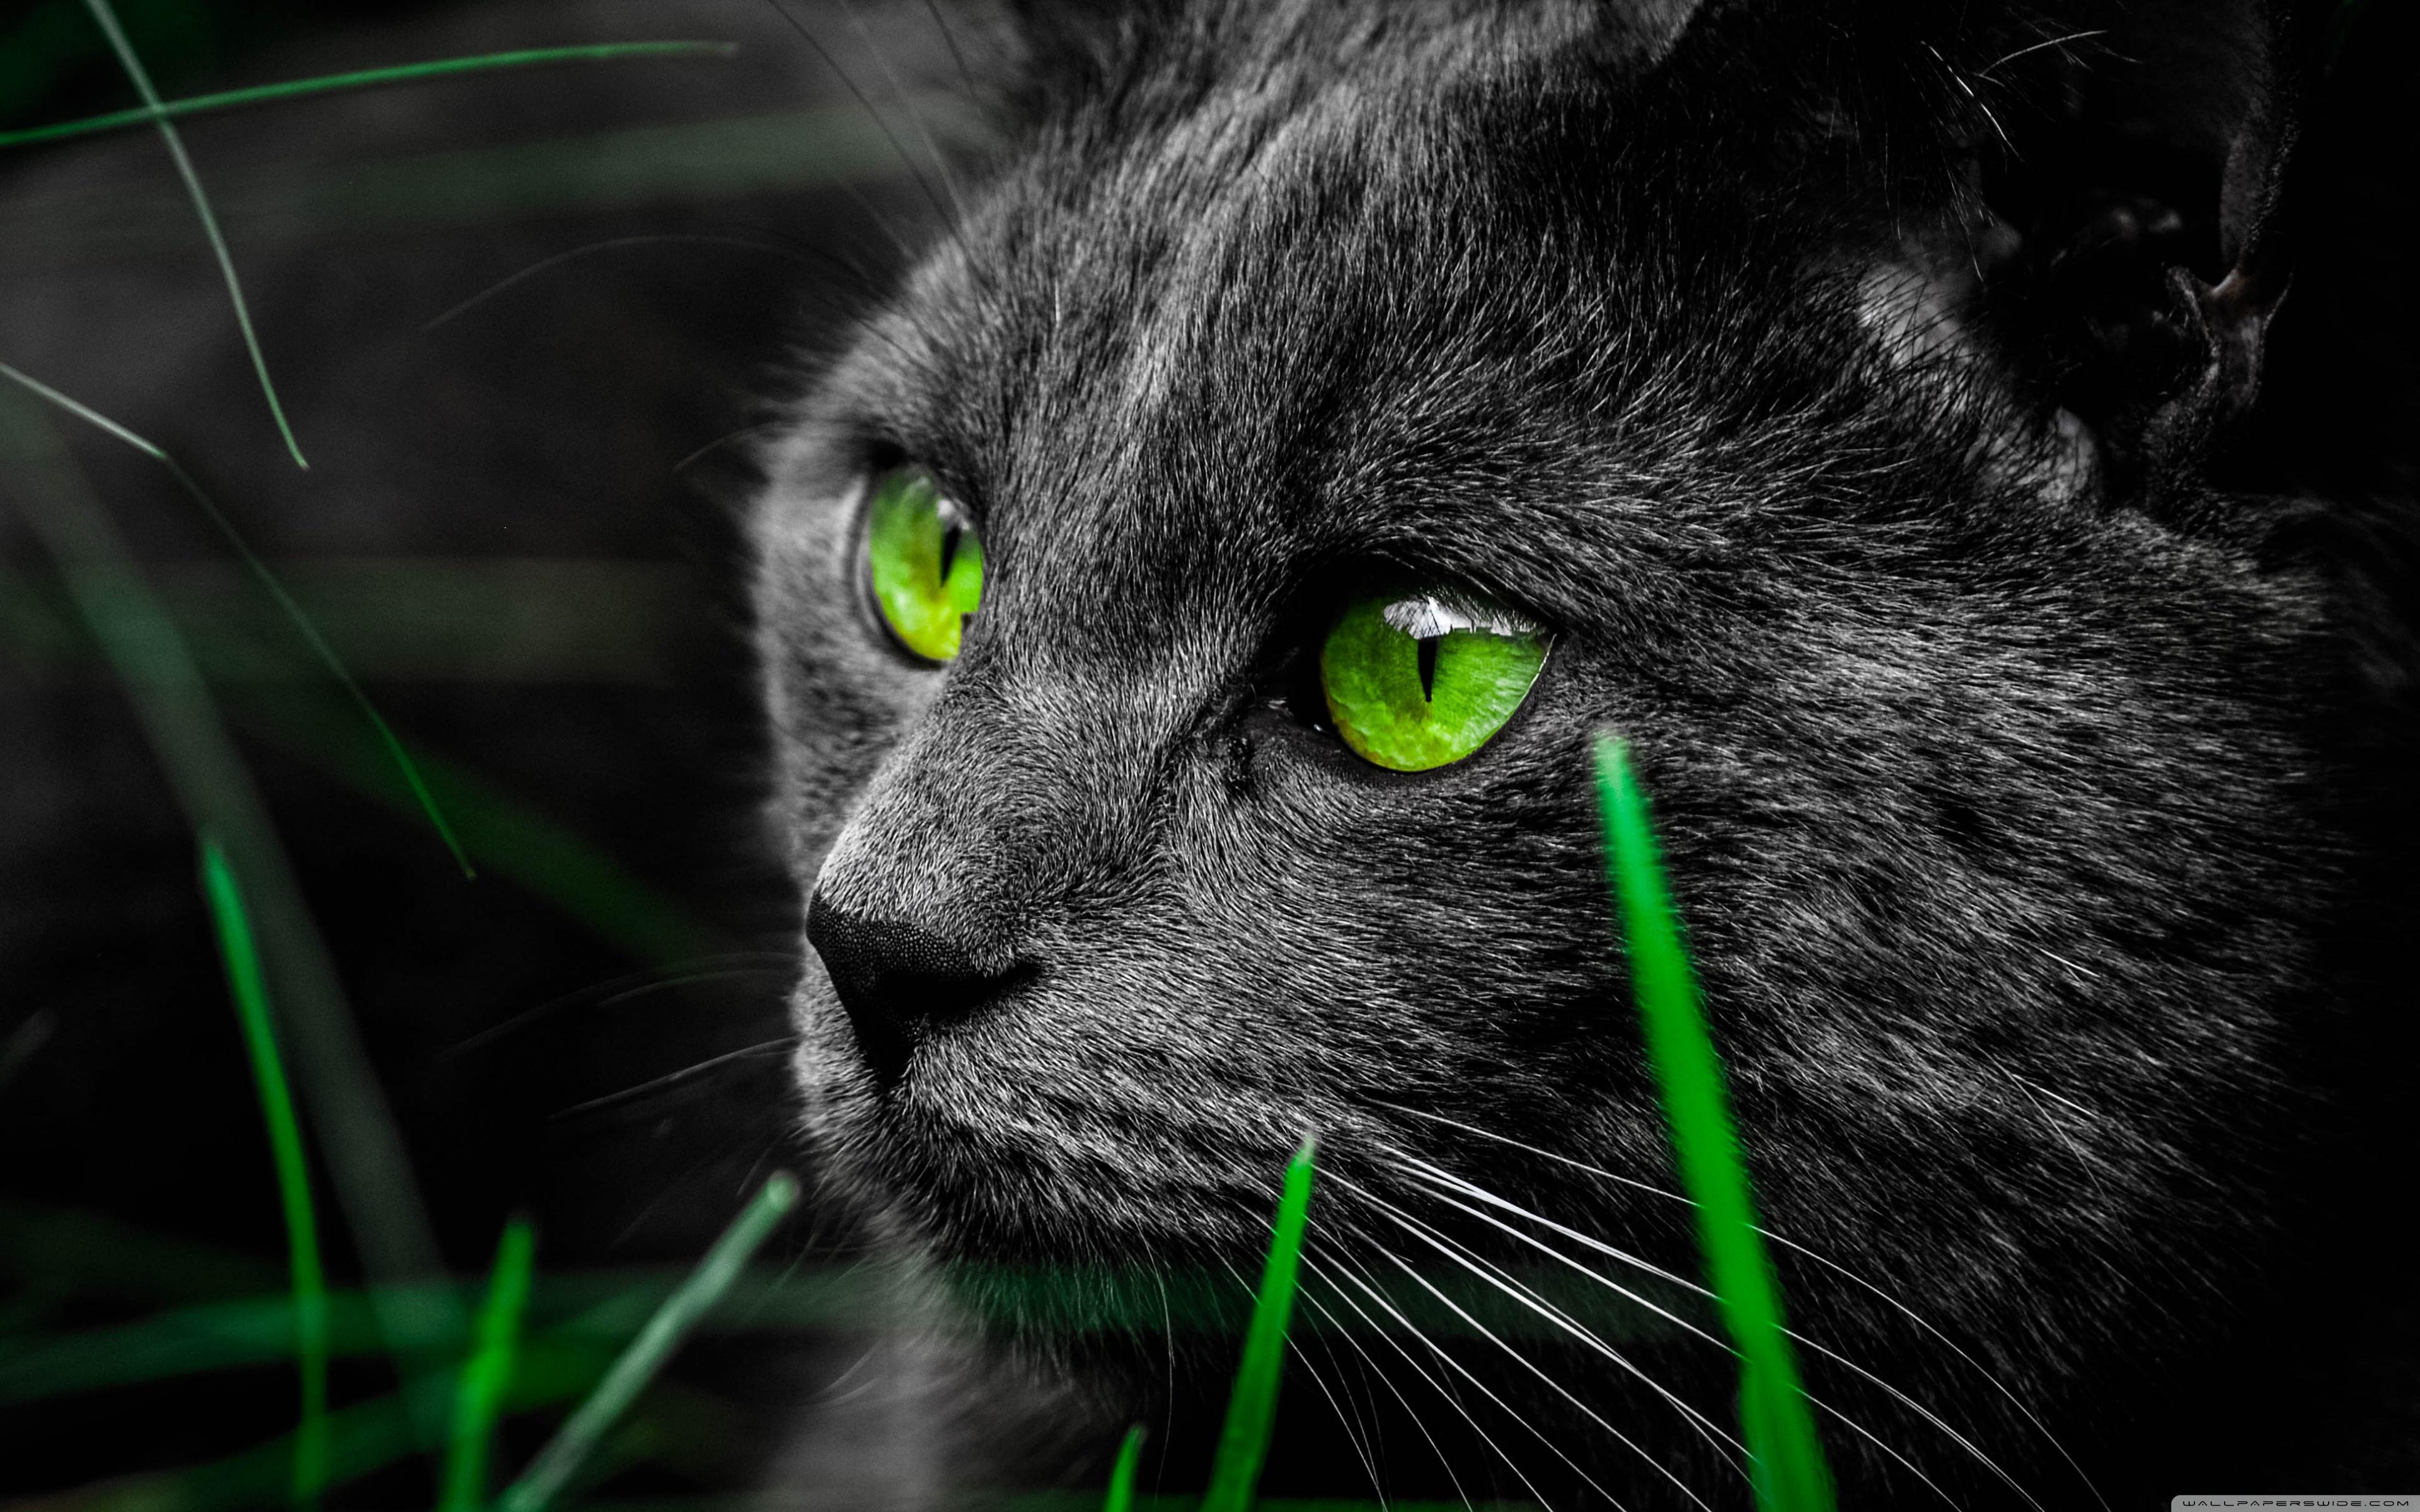 4k ultra hd wallpapers,cat,mammal,vertebrate,green,whiskers